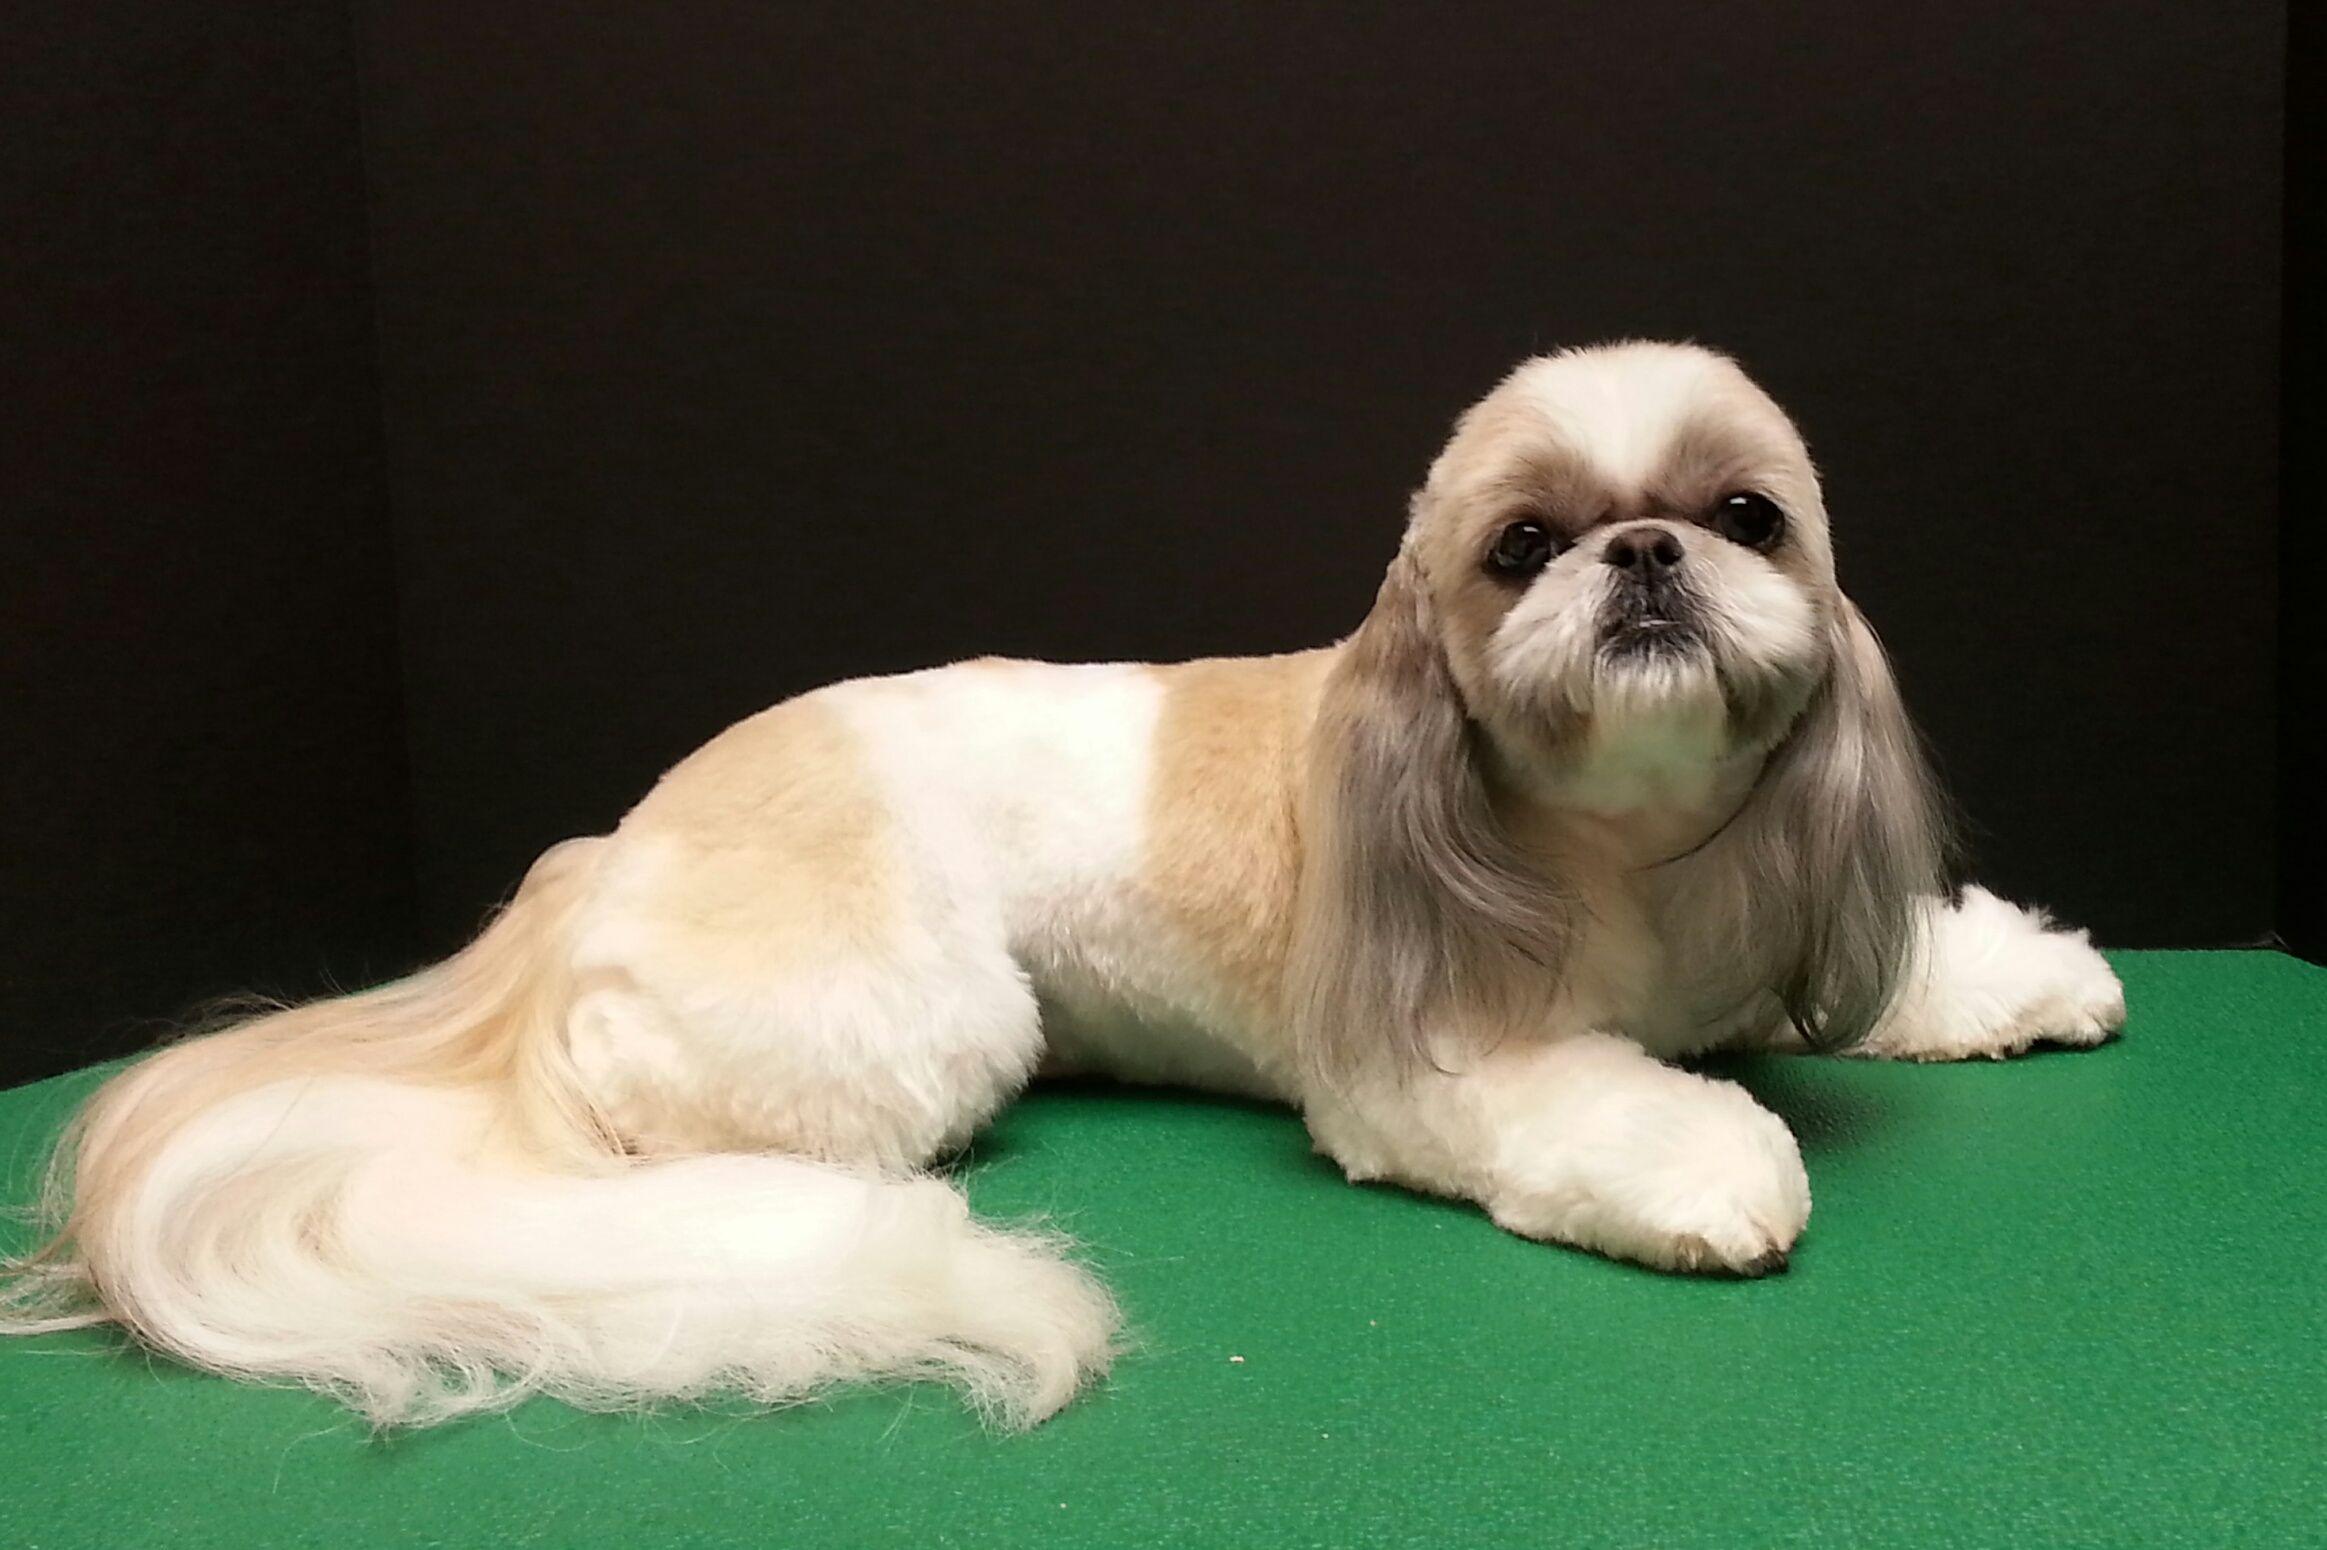 Shih Tzu Shih Tzu Haircut Dog Grooming Shih Tzu Pinterest